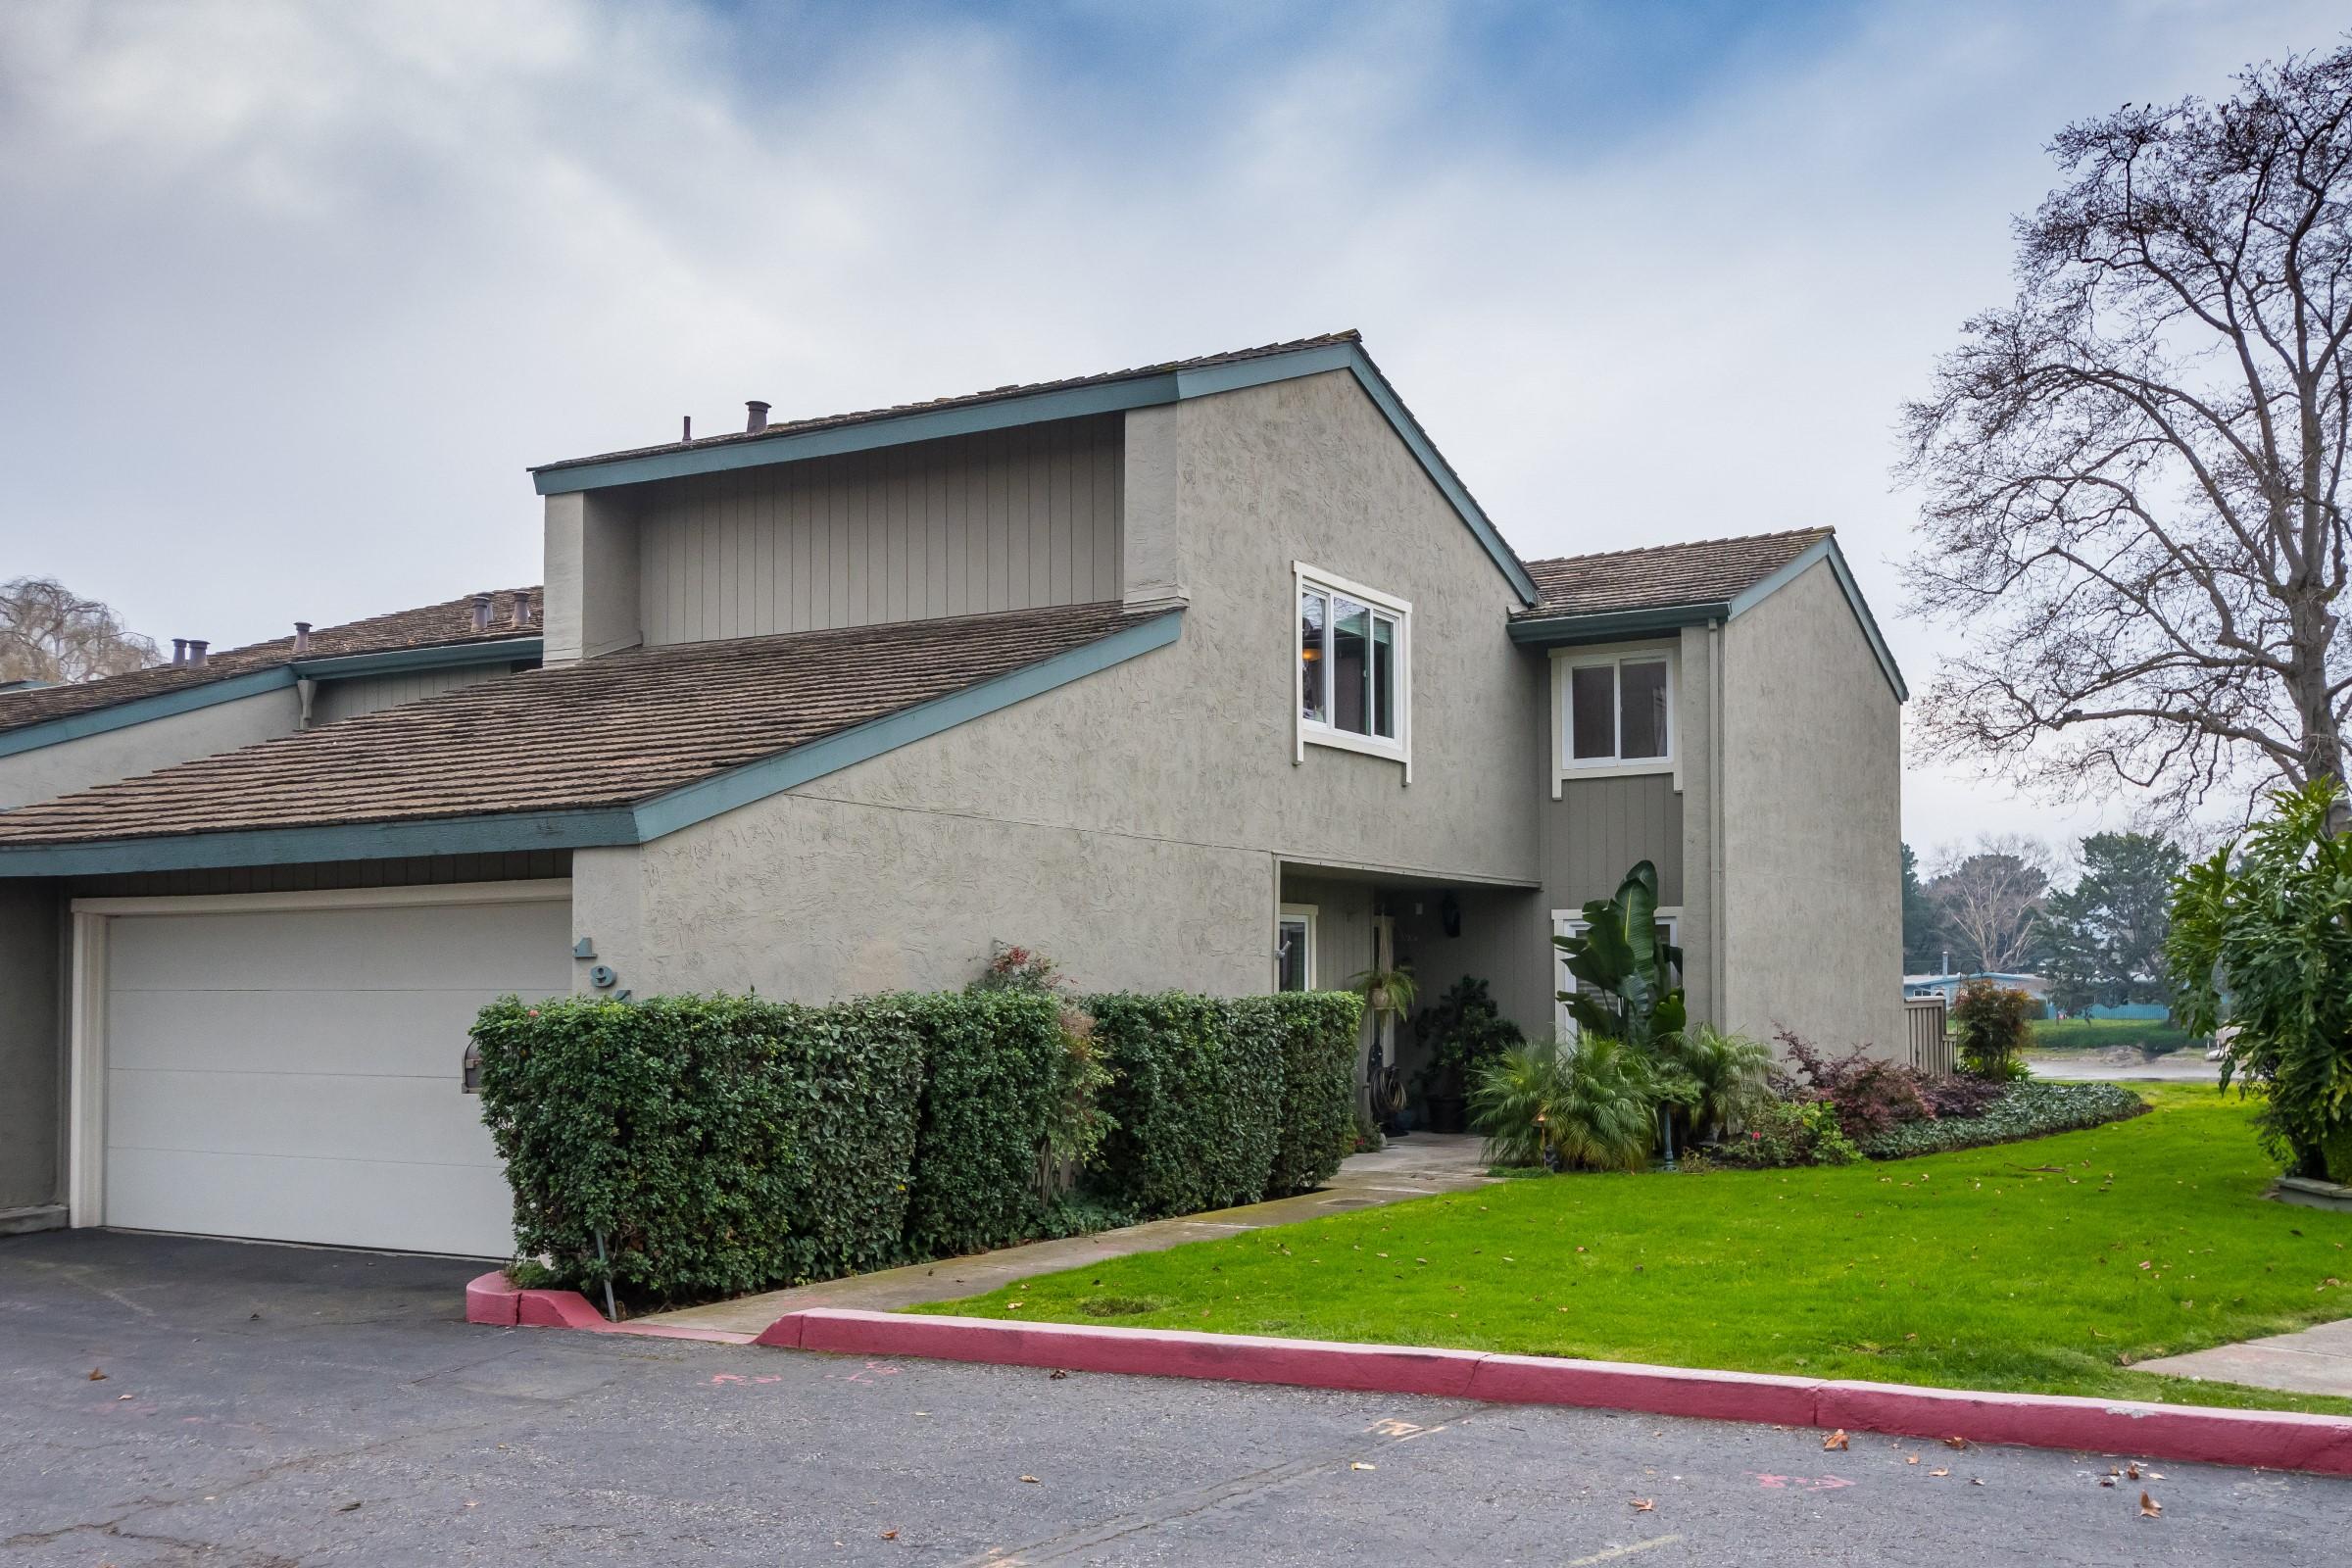 194 Beach Park Blvd, Foster City, CA 94404